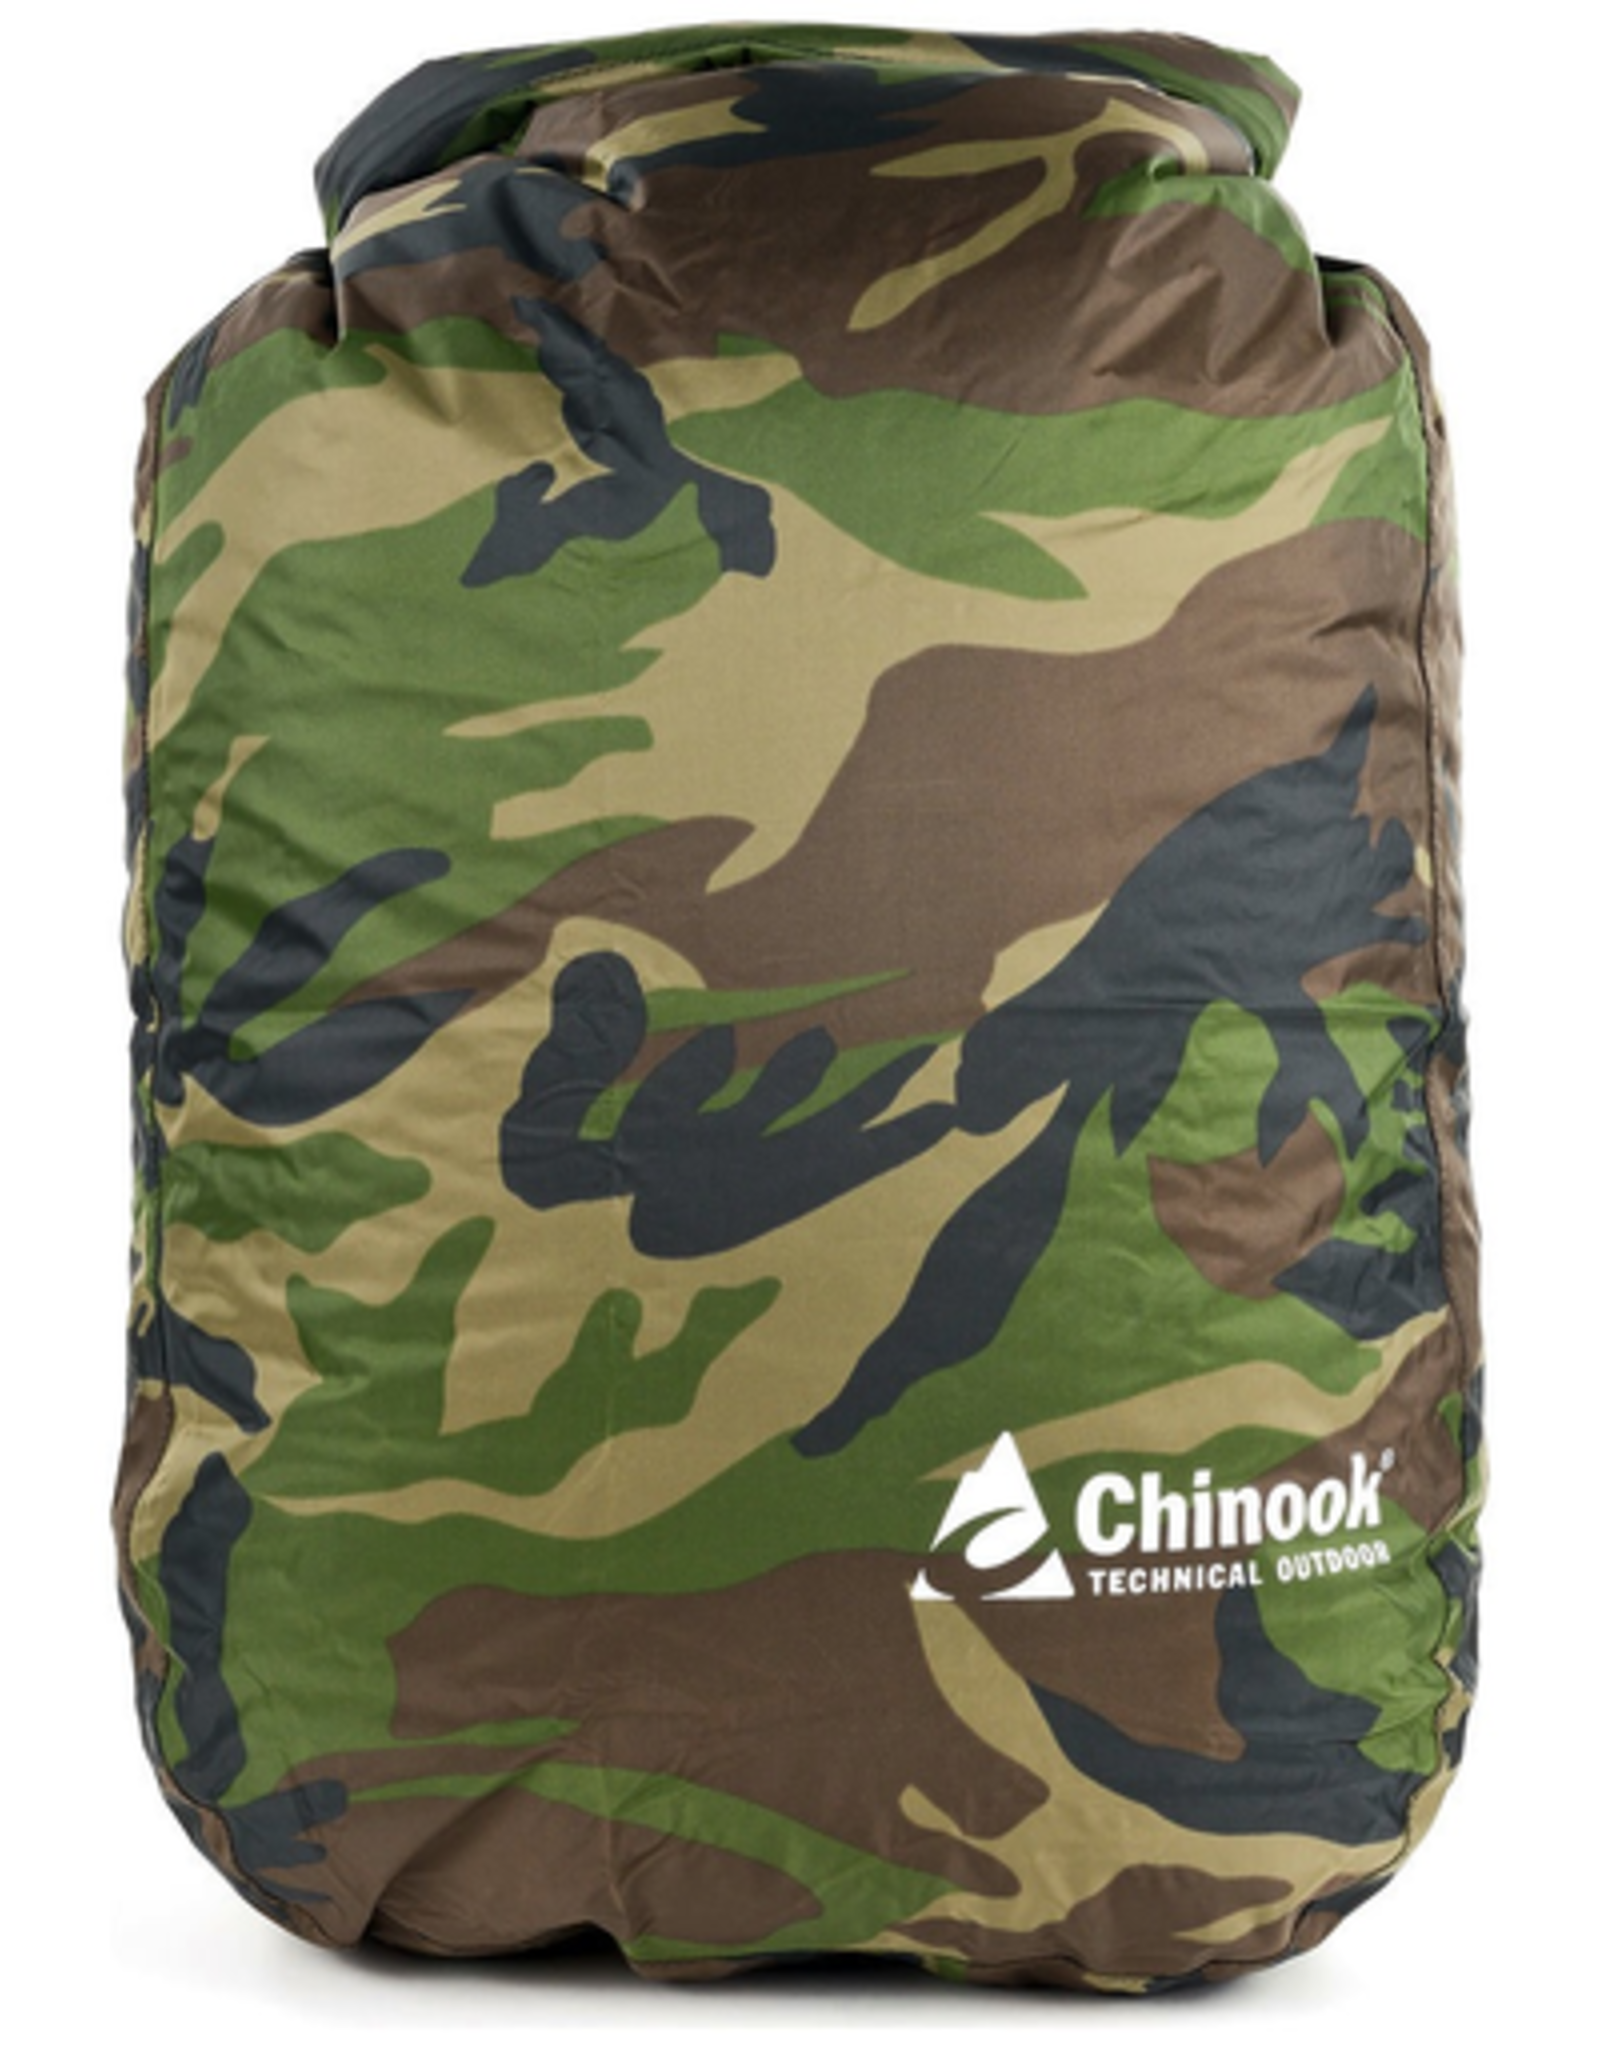 Chinook Chinook Aqualite 45L Dry Bag, Camo